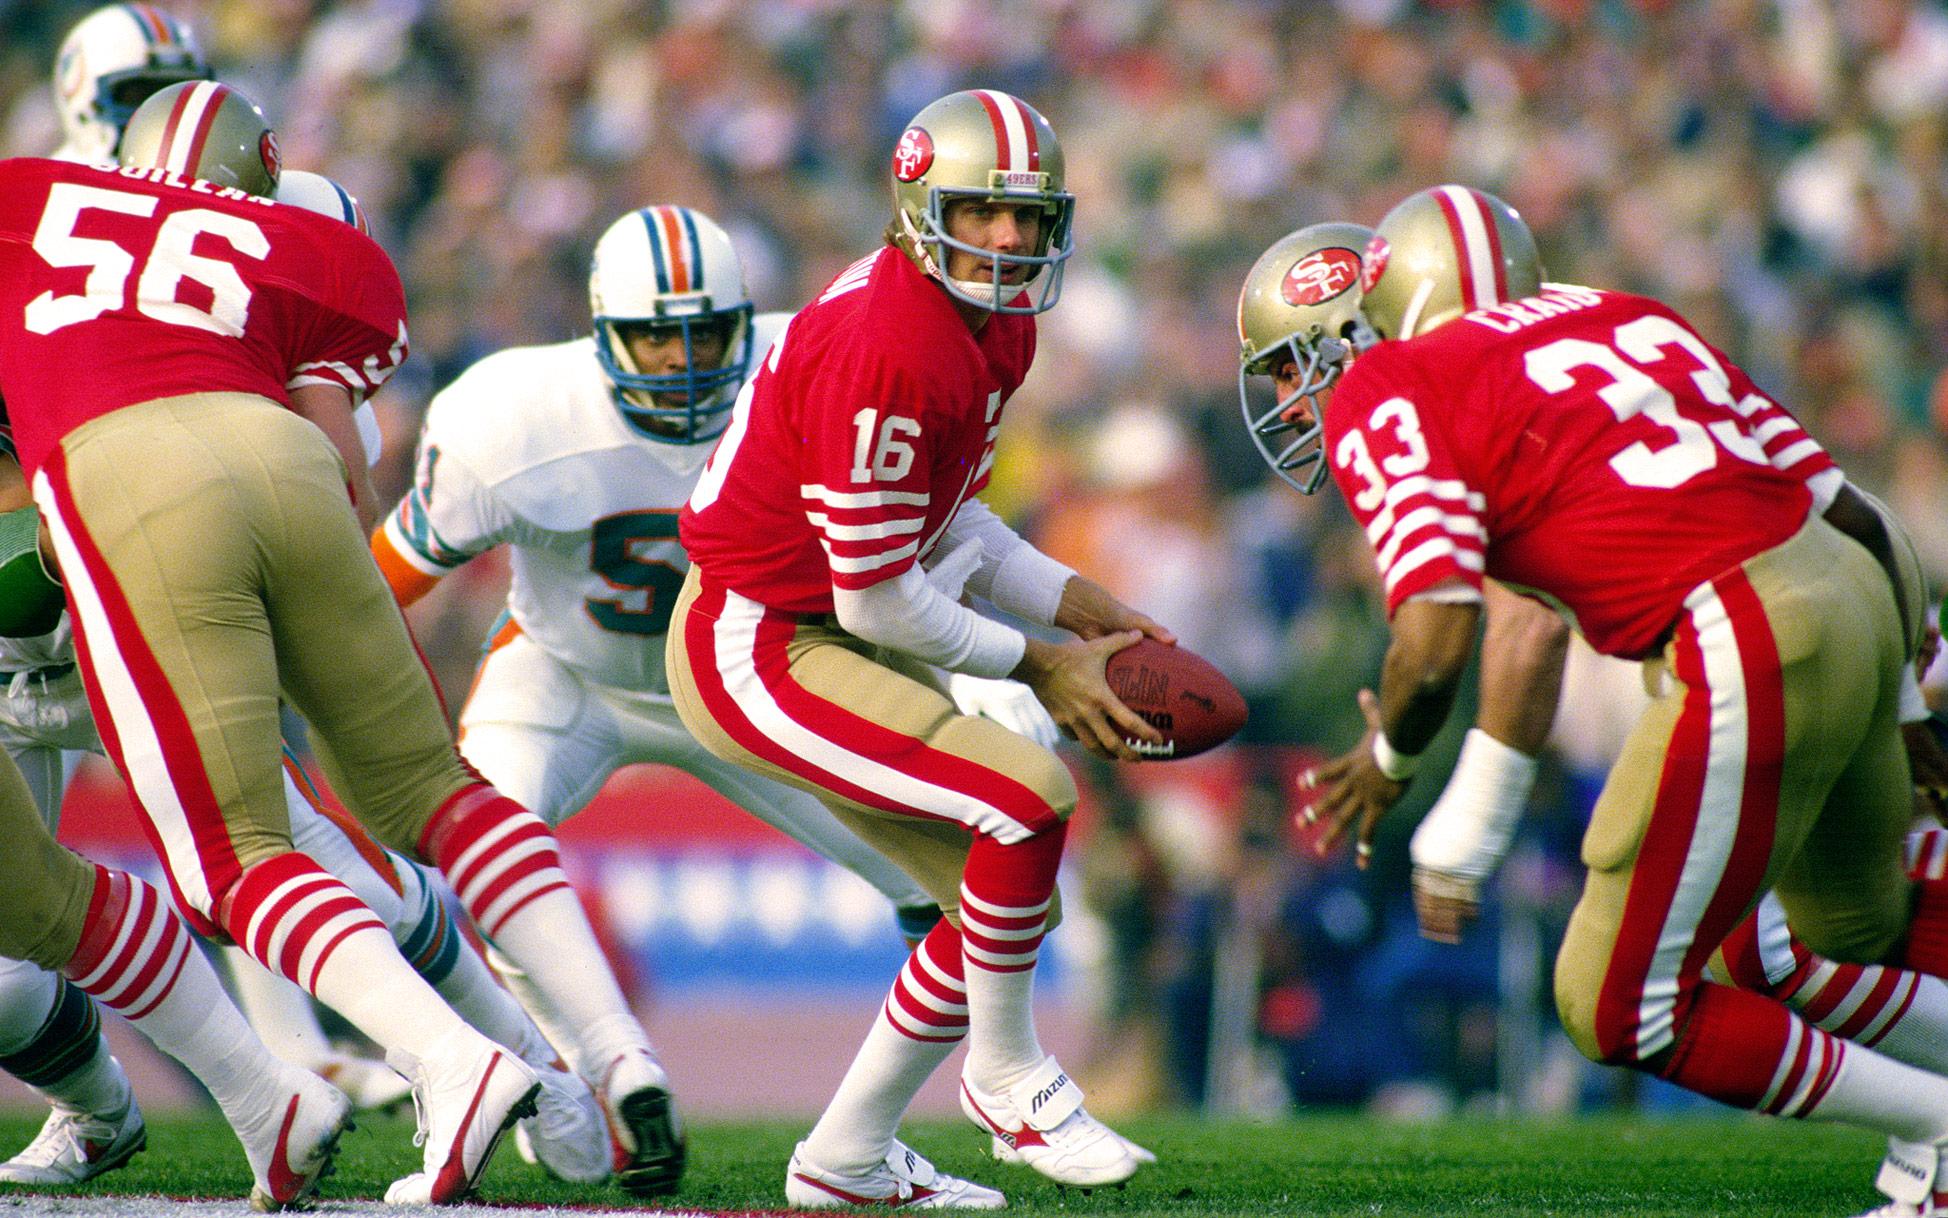 Joe Montana - Super Bowl XIX (24/35, 331 yards, 3 TD; 59 rushing yards, 1 TD)